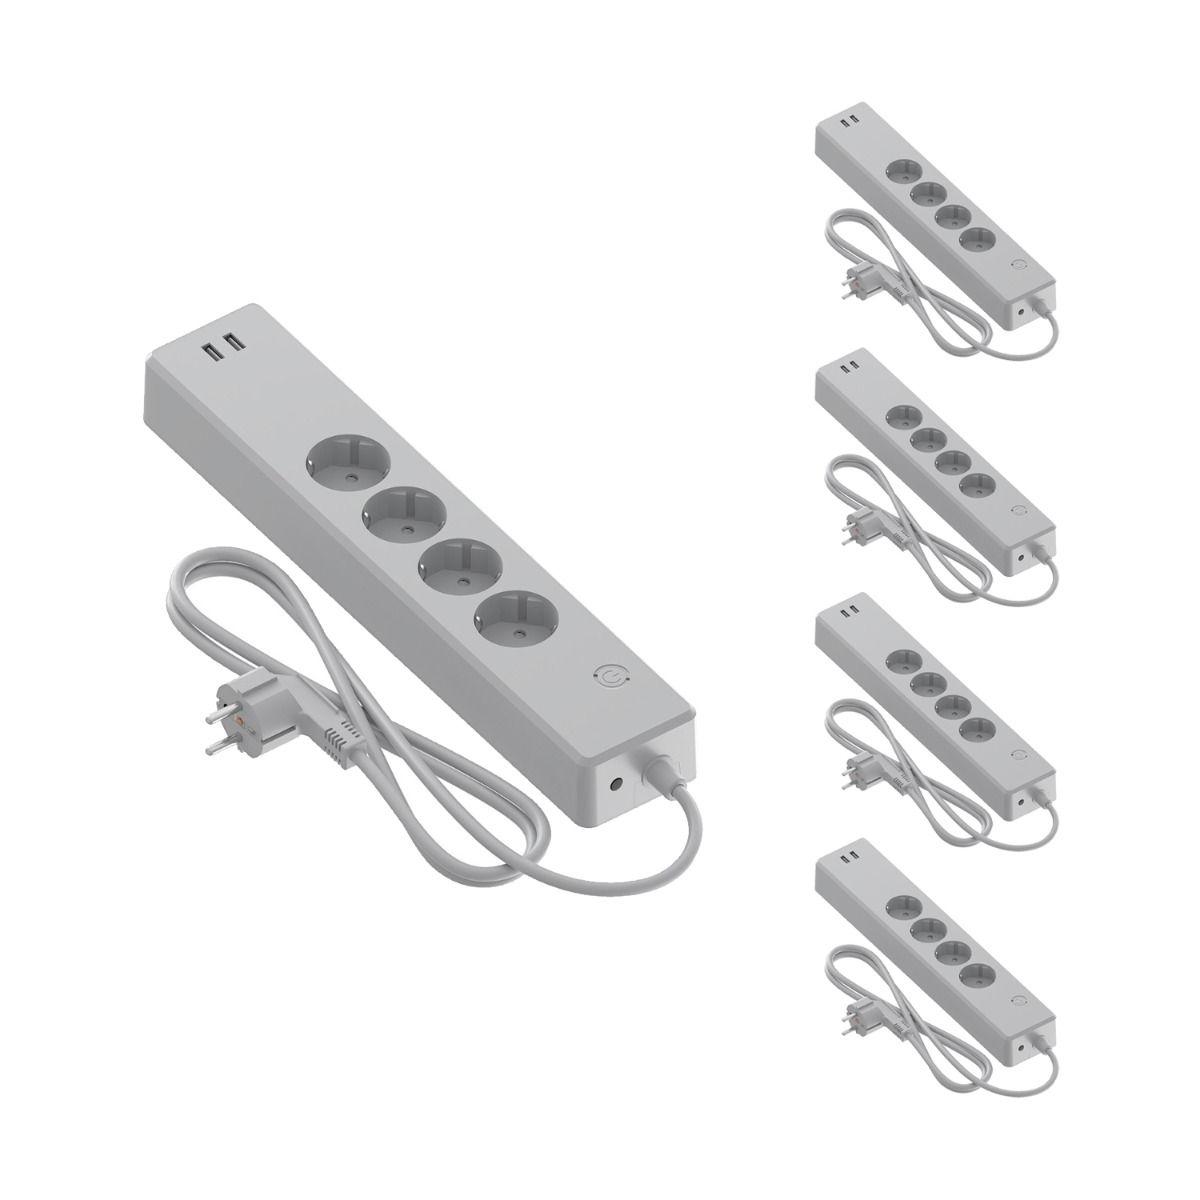 Multipack 5x Calex Smart Power Strip + USB EU | Tuya Wifi